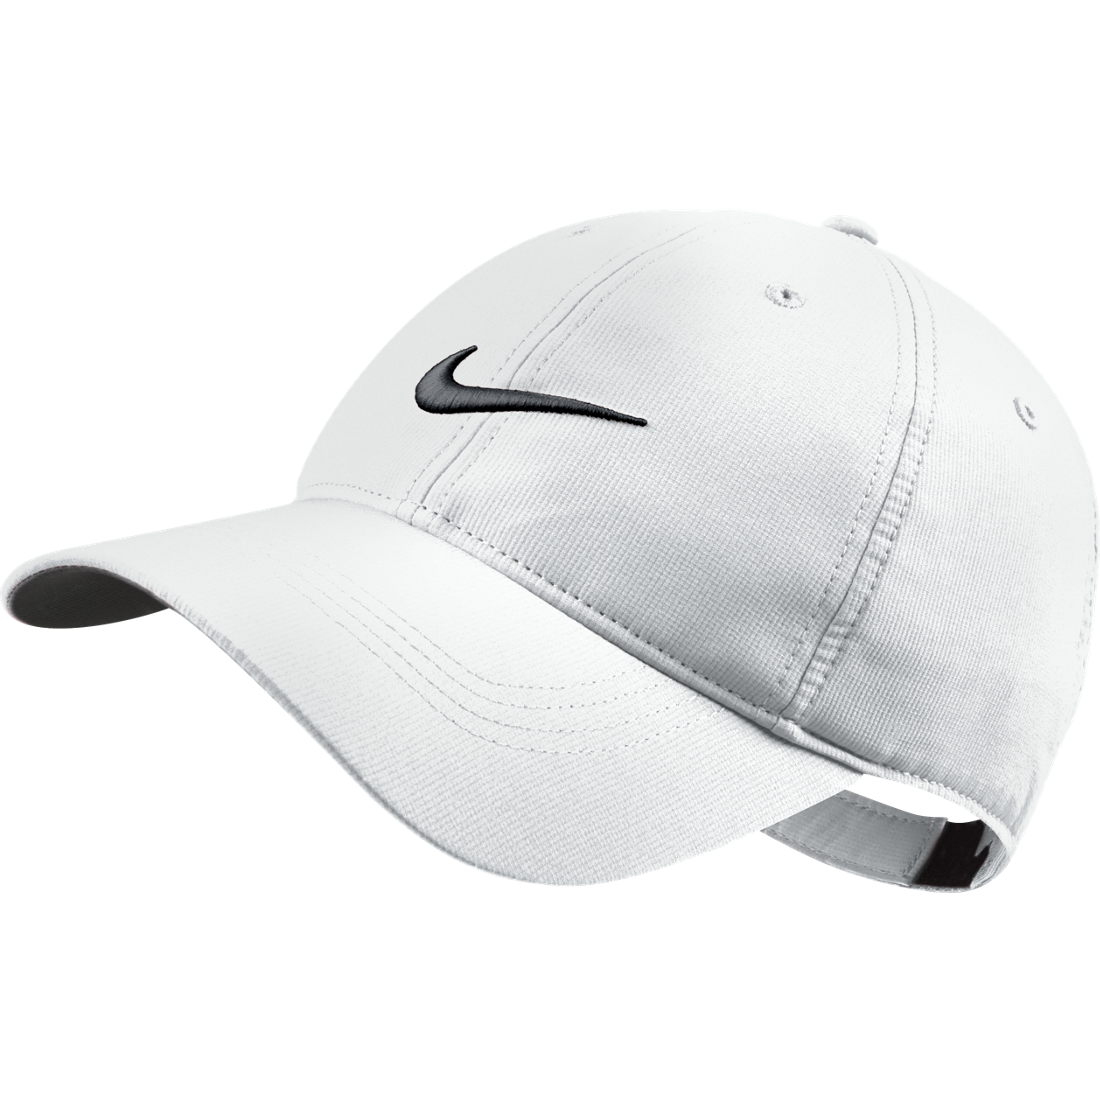 eeadb08de Nike Dri-FIT Tech Swoosh Cap